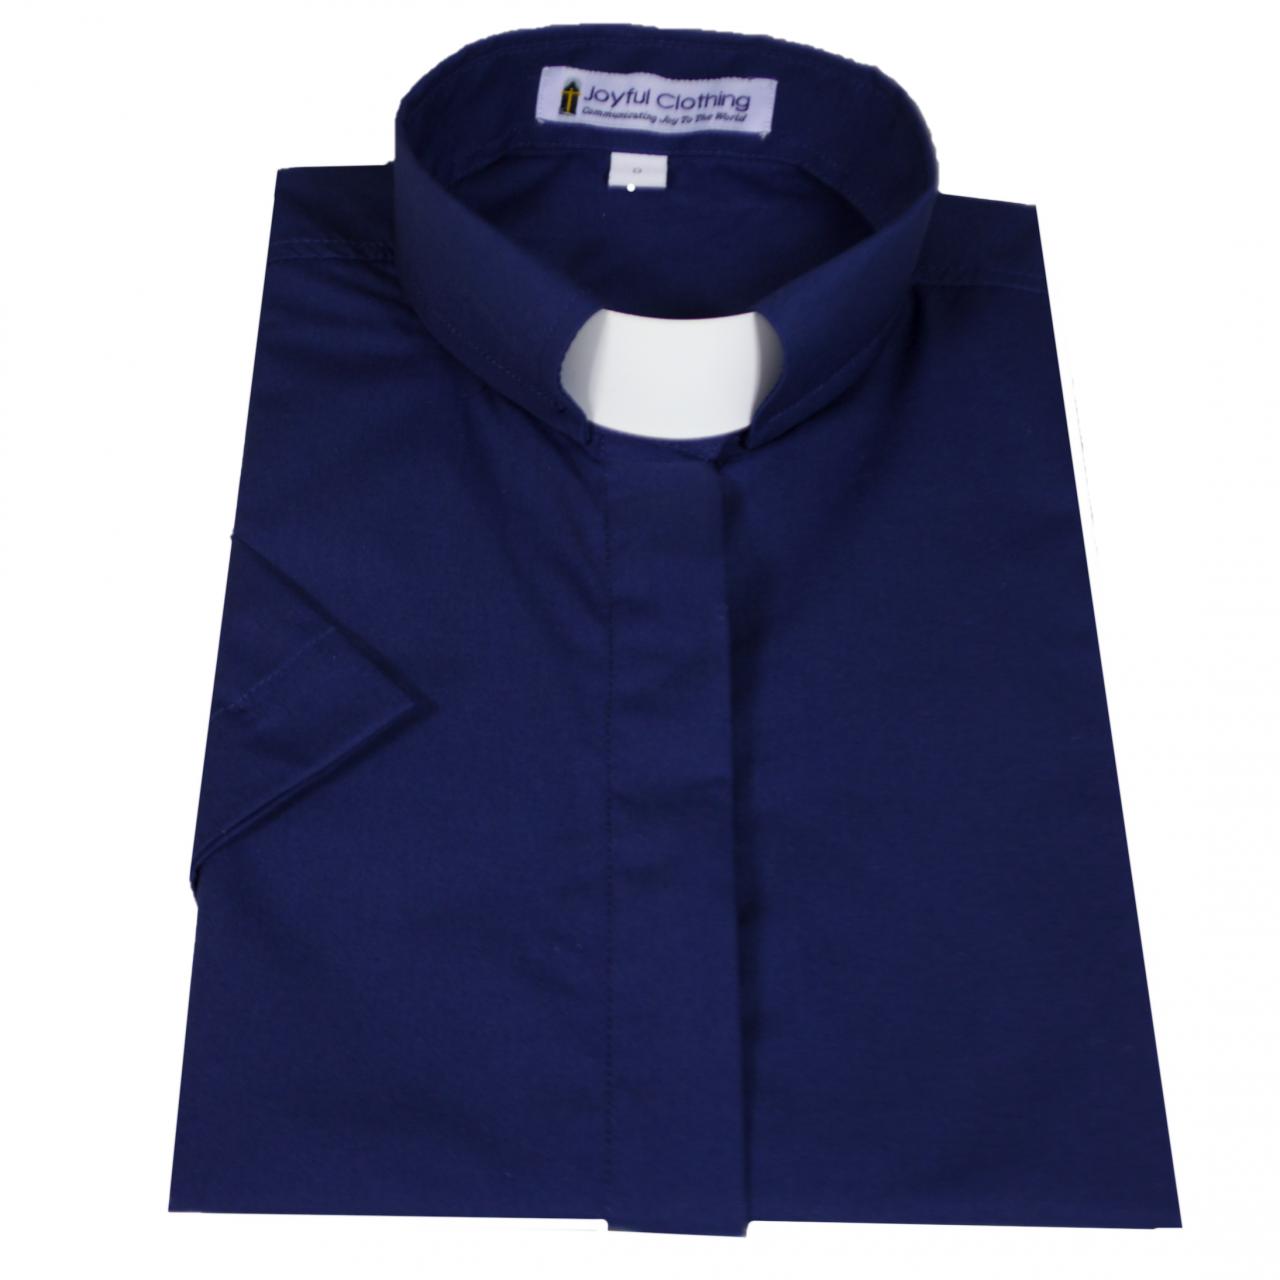 575. Women's Short-Sleeve Tab-Collar Clergy Shirt - Navy Blue